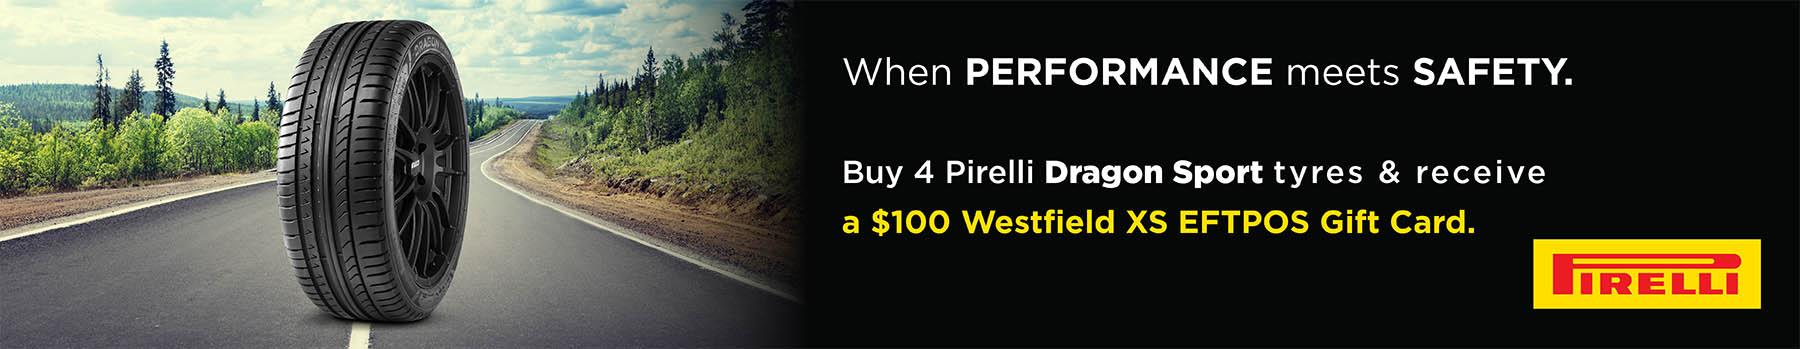 $100 Pirelli Gift Card